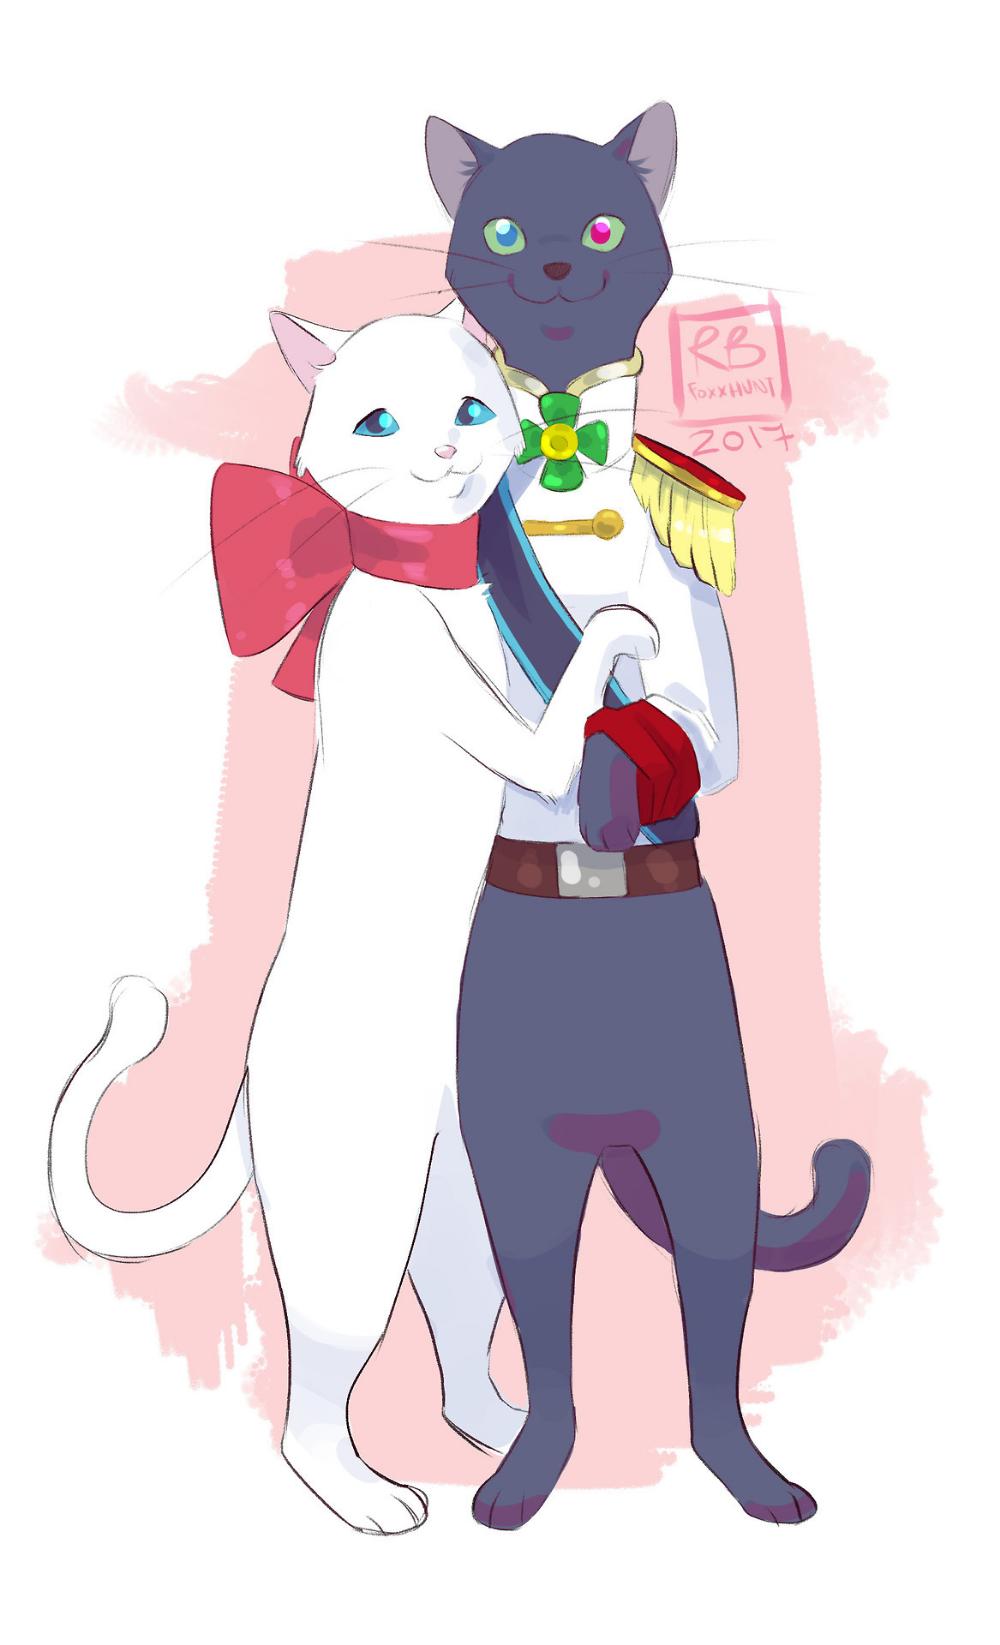 studio ghibli fanart Tumblr Le royaume des chats